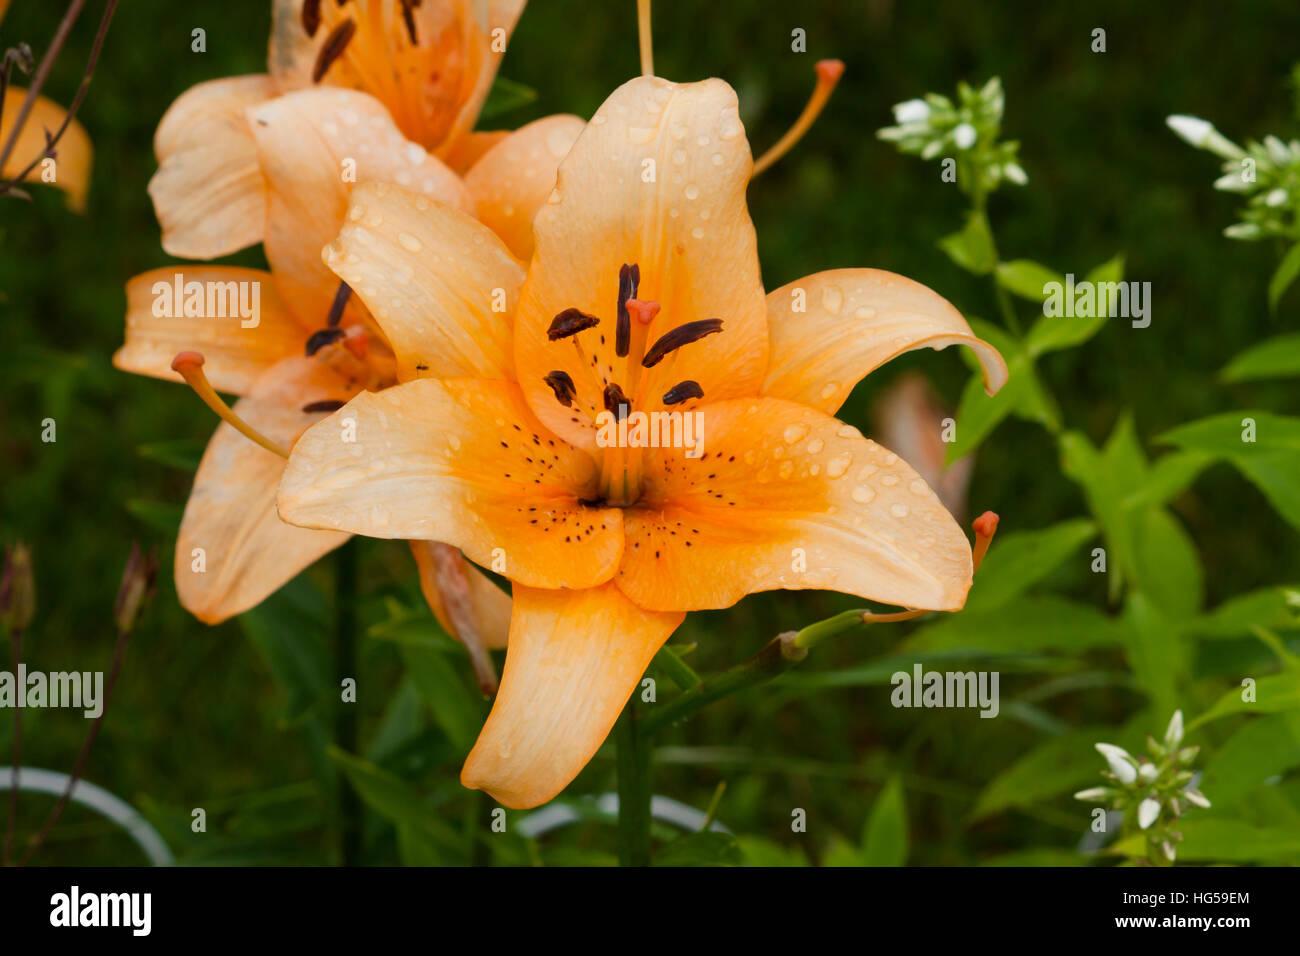 Lilium flower language stock photos lilium flower language stock beautiful orange lily flower large close up macro stock image izmirmasajfo